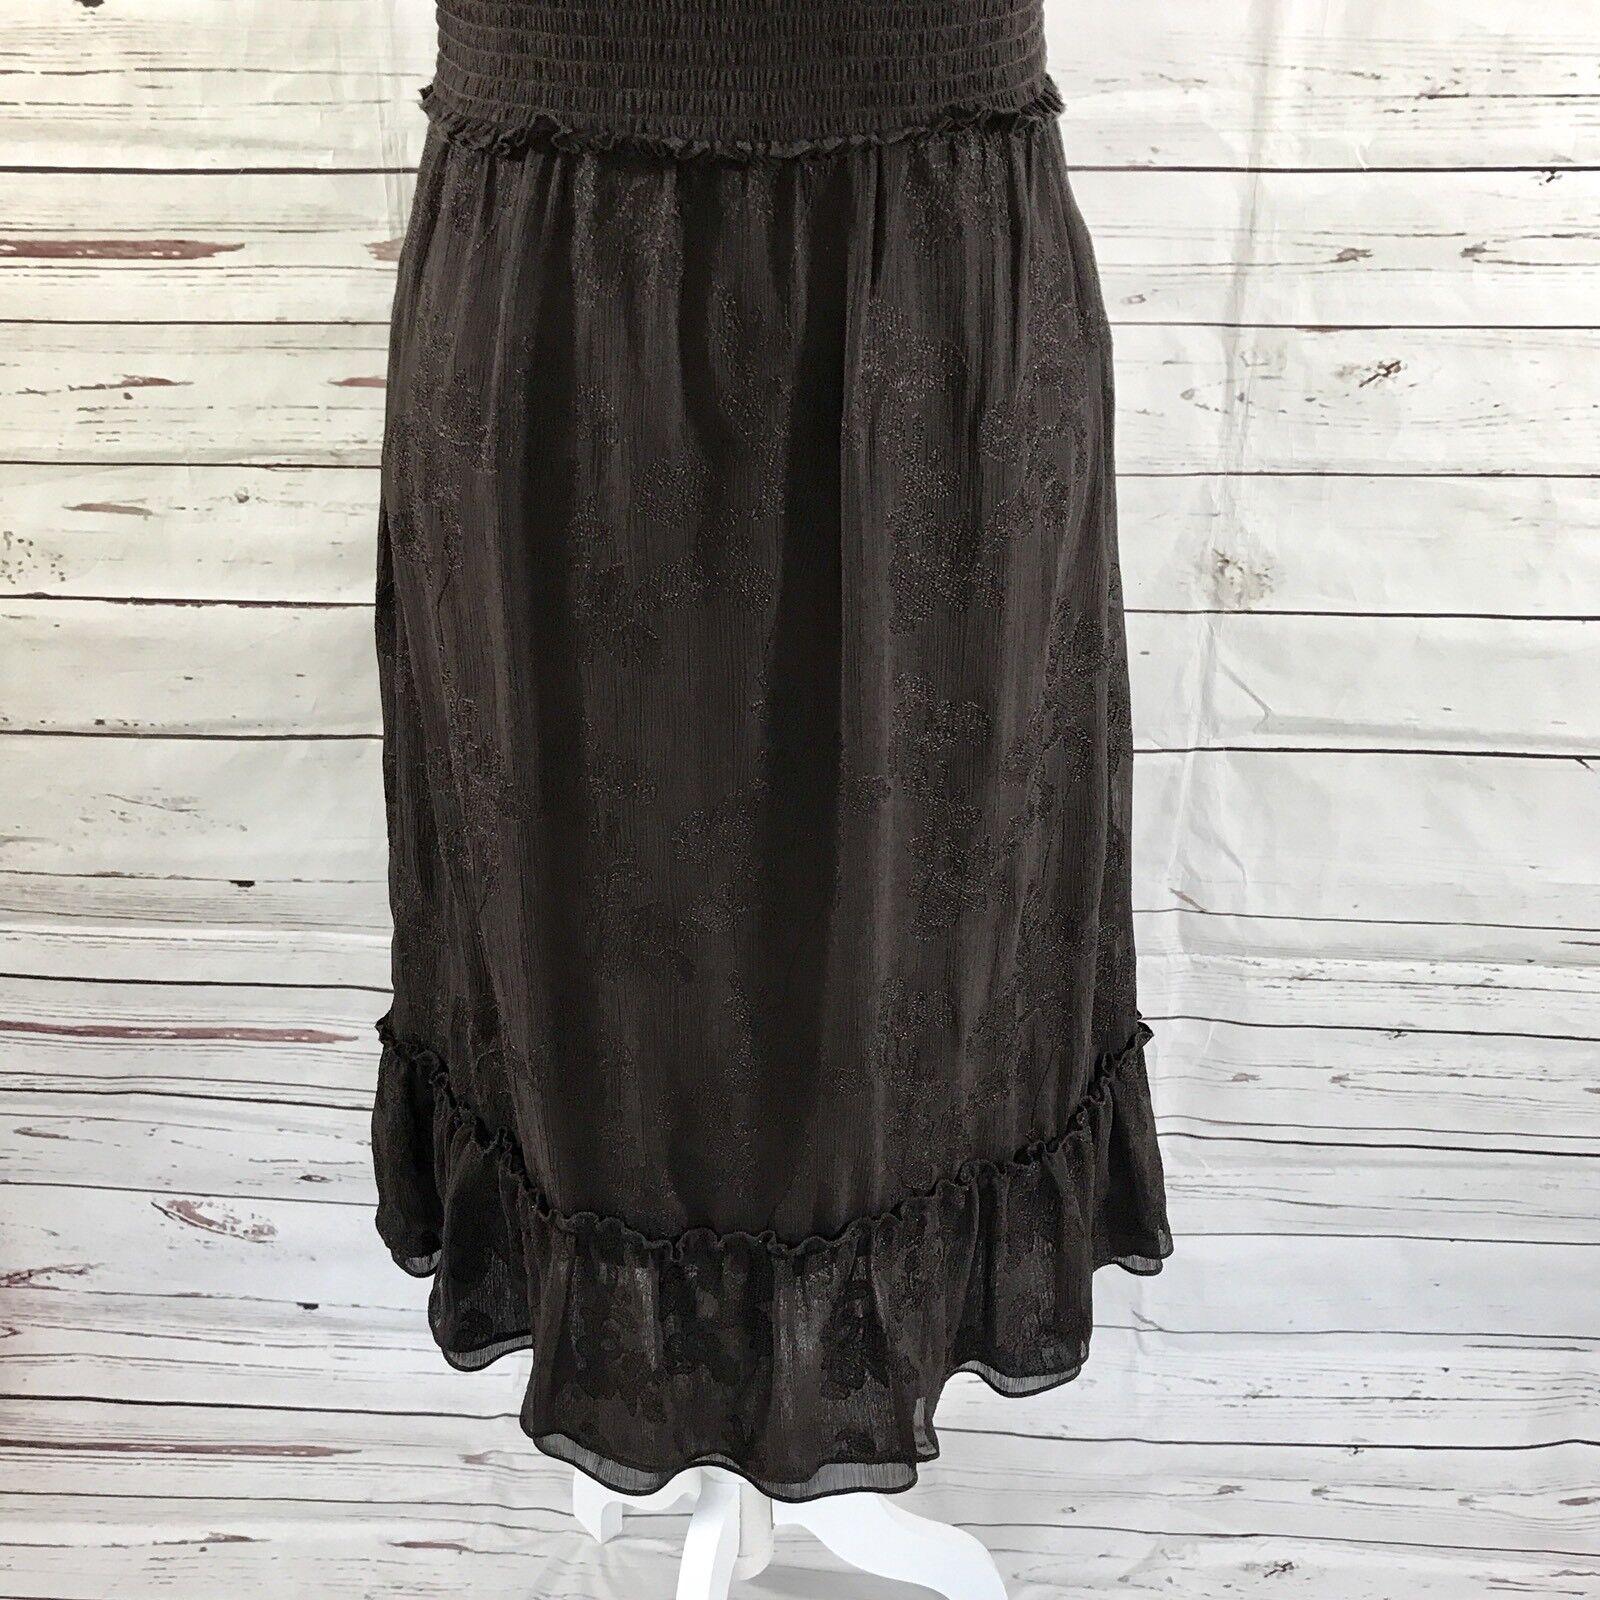 065cf712aae ... Antonio Melani Sleeveless Sleeveless Sleeveless Dress Empire Waist  Brown Embroidery Floral Size 10 a26467 ...